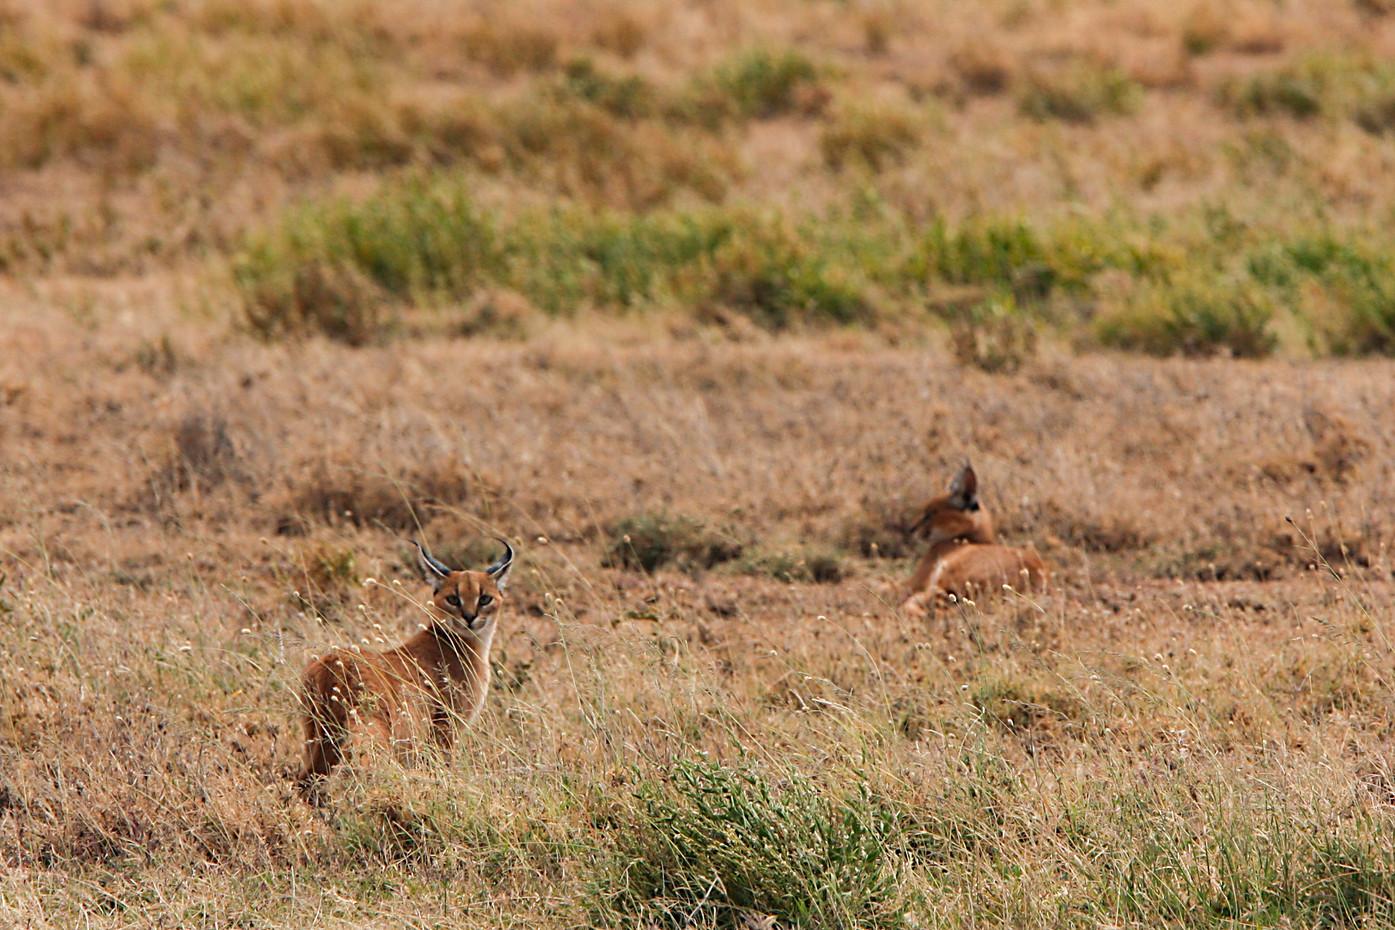 Caracals in the Serengeti NP, Tanzania